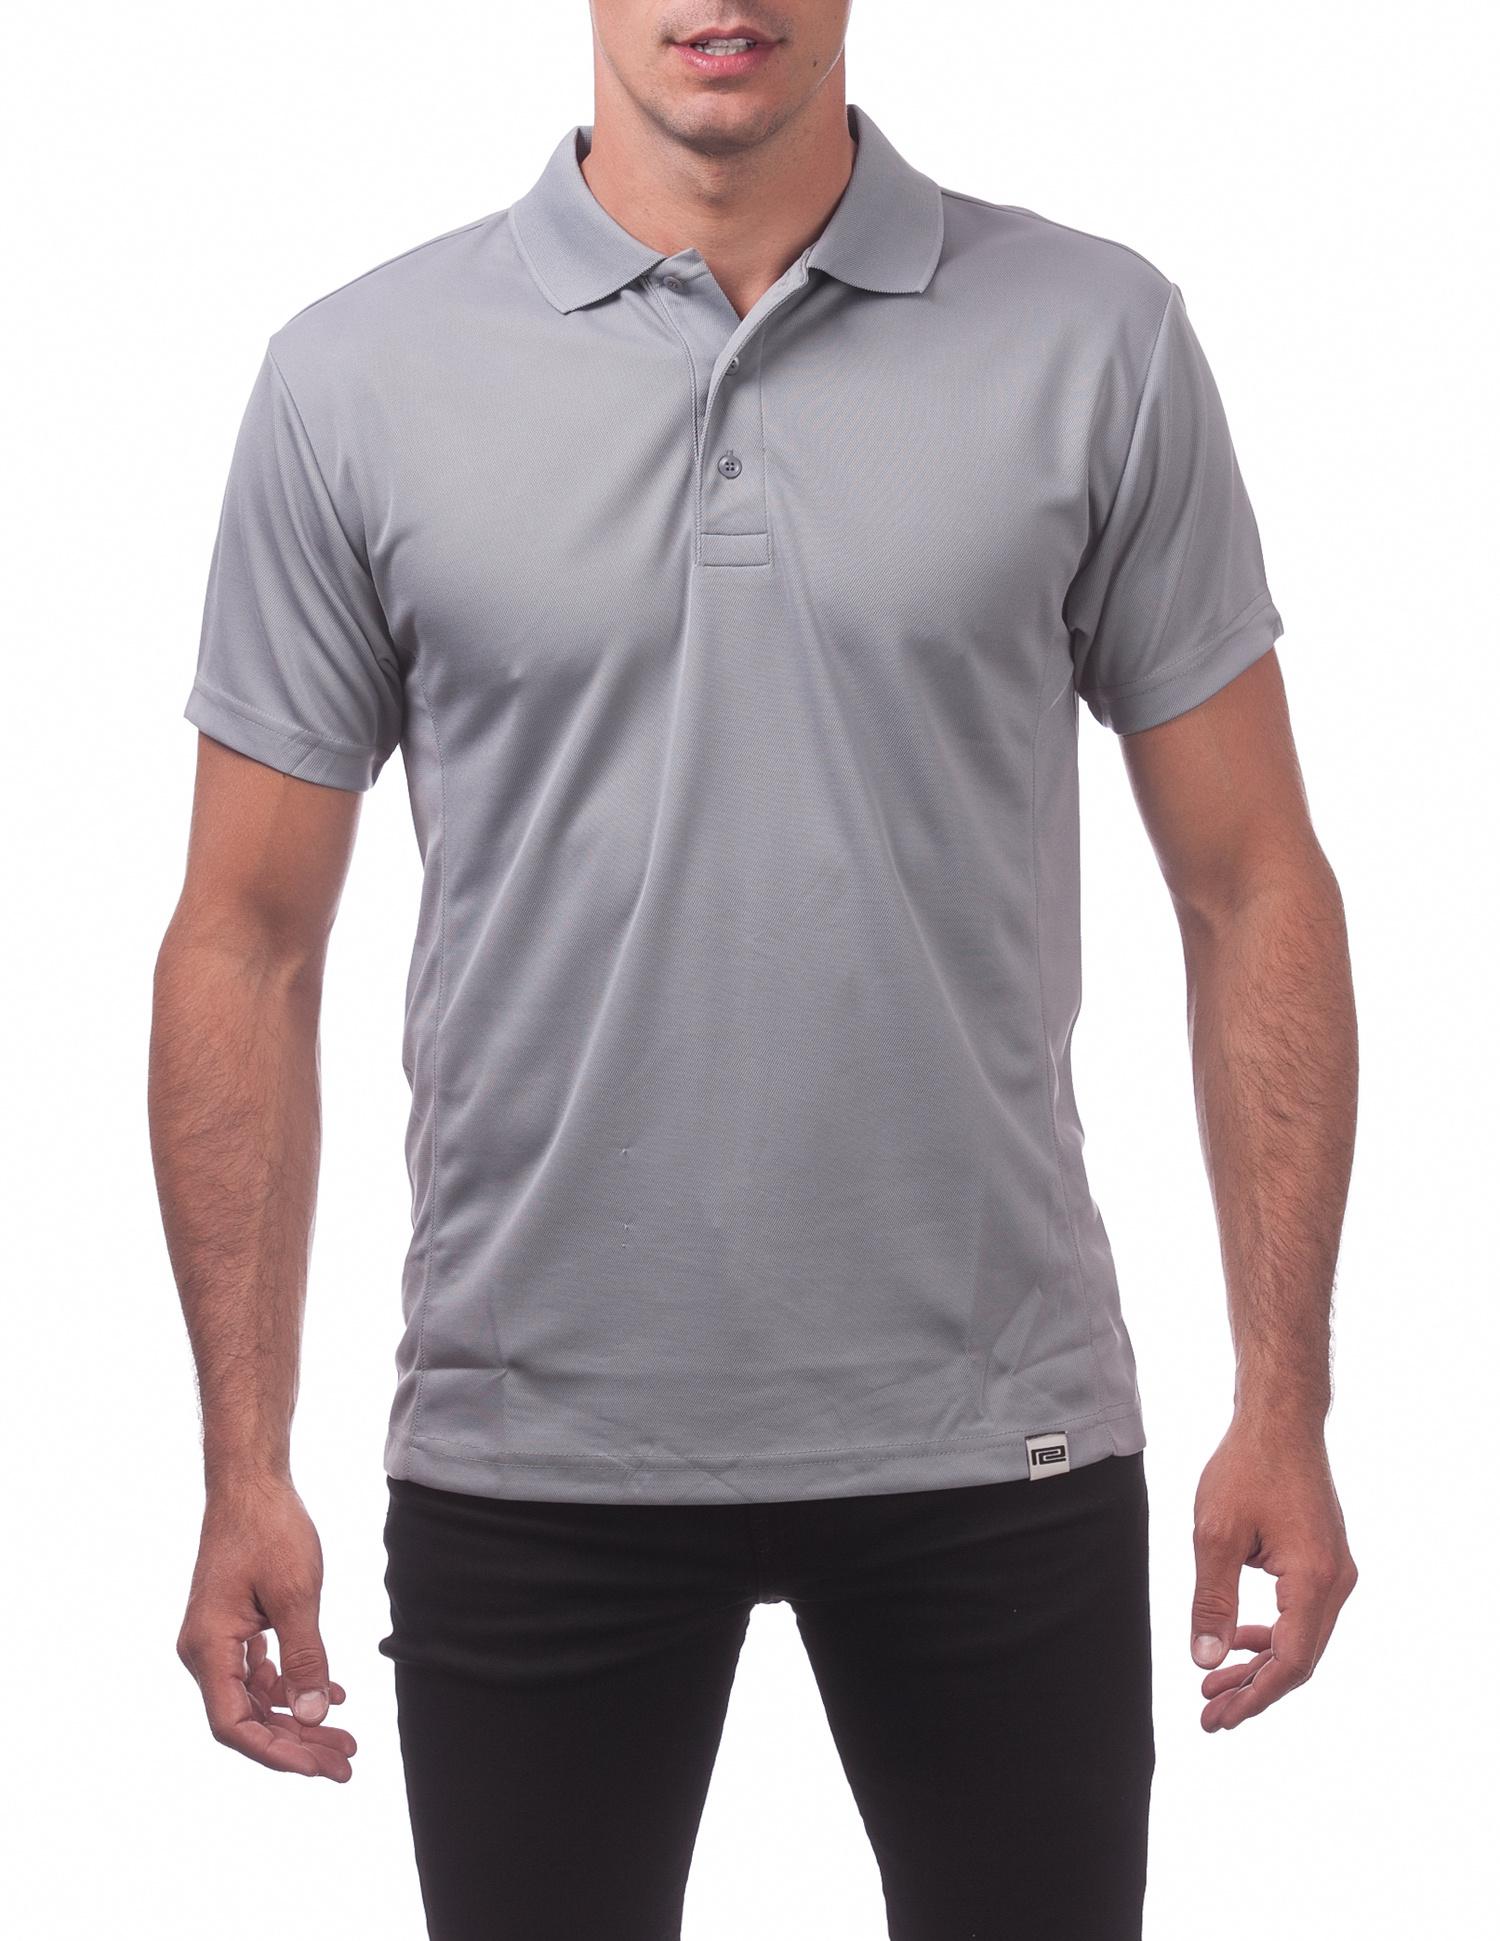 155 Gray Performance Drypro Short Sleeve Polo Long Sleeve Tee